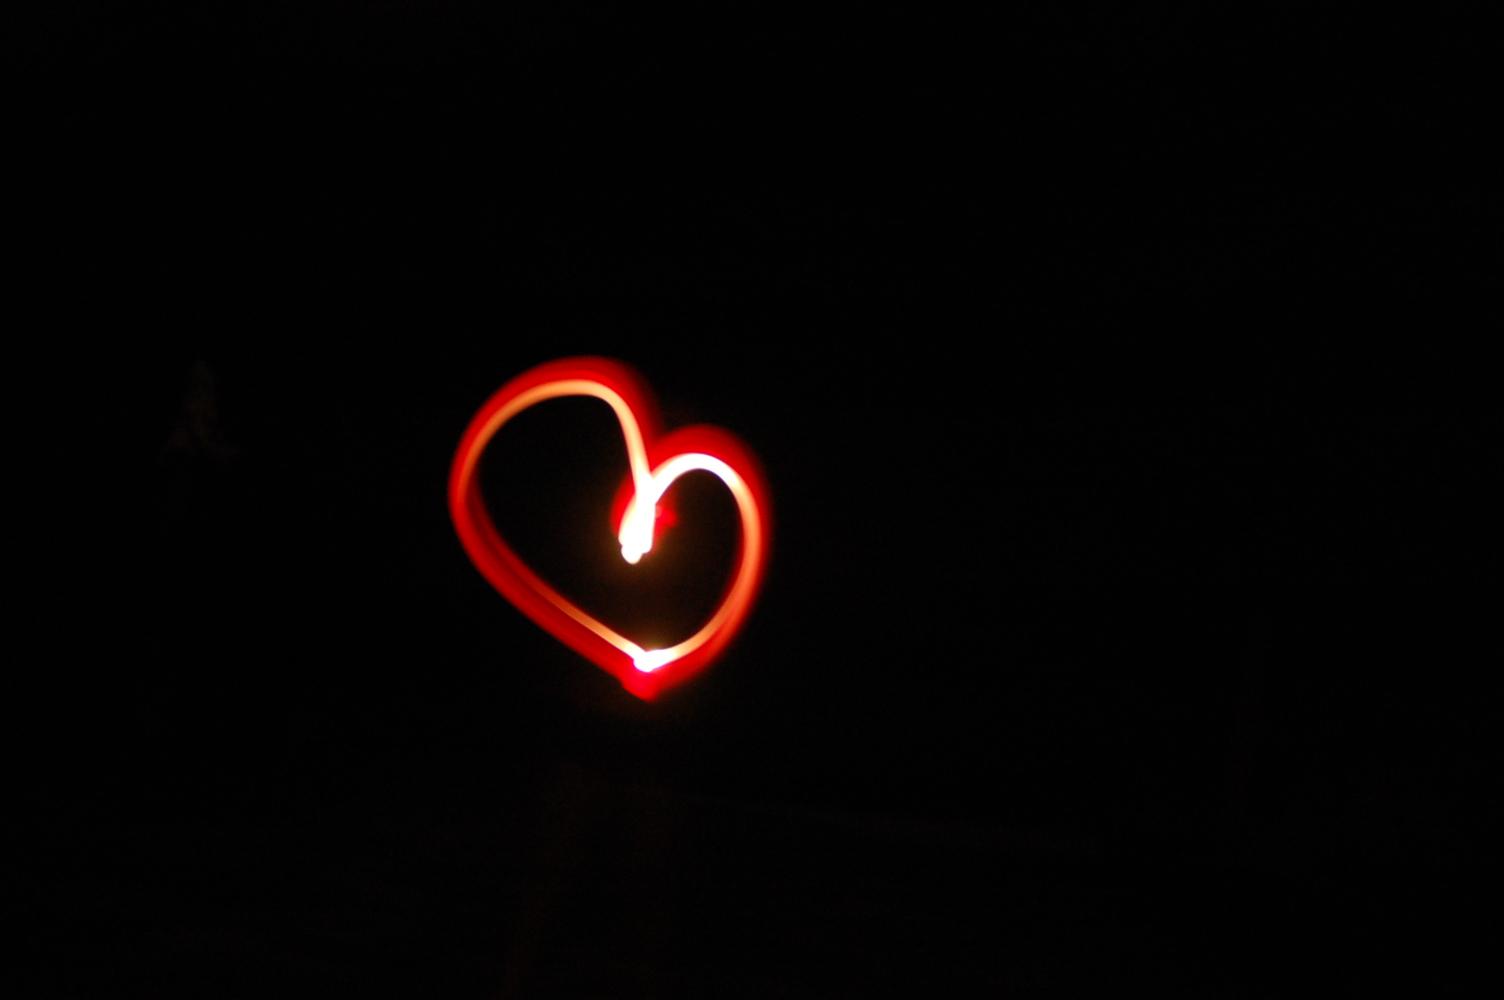 Red Heart by xlyricdx3